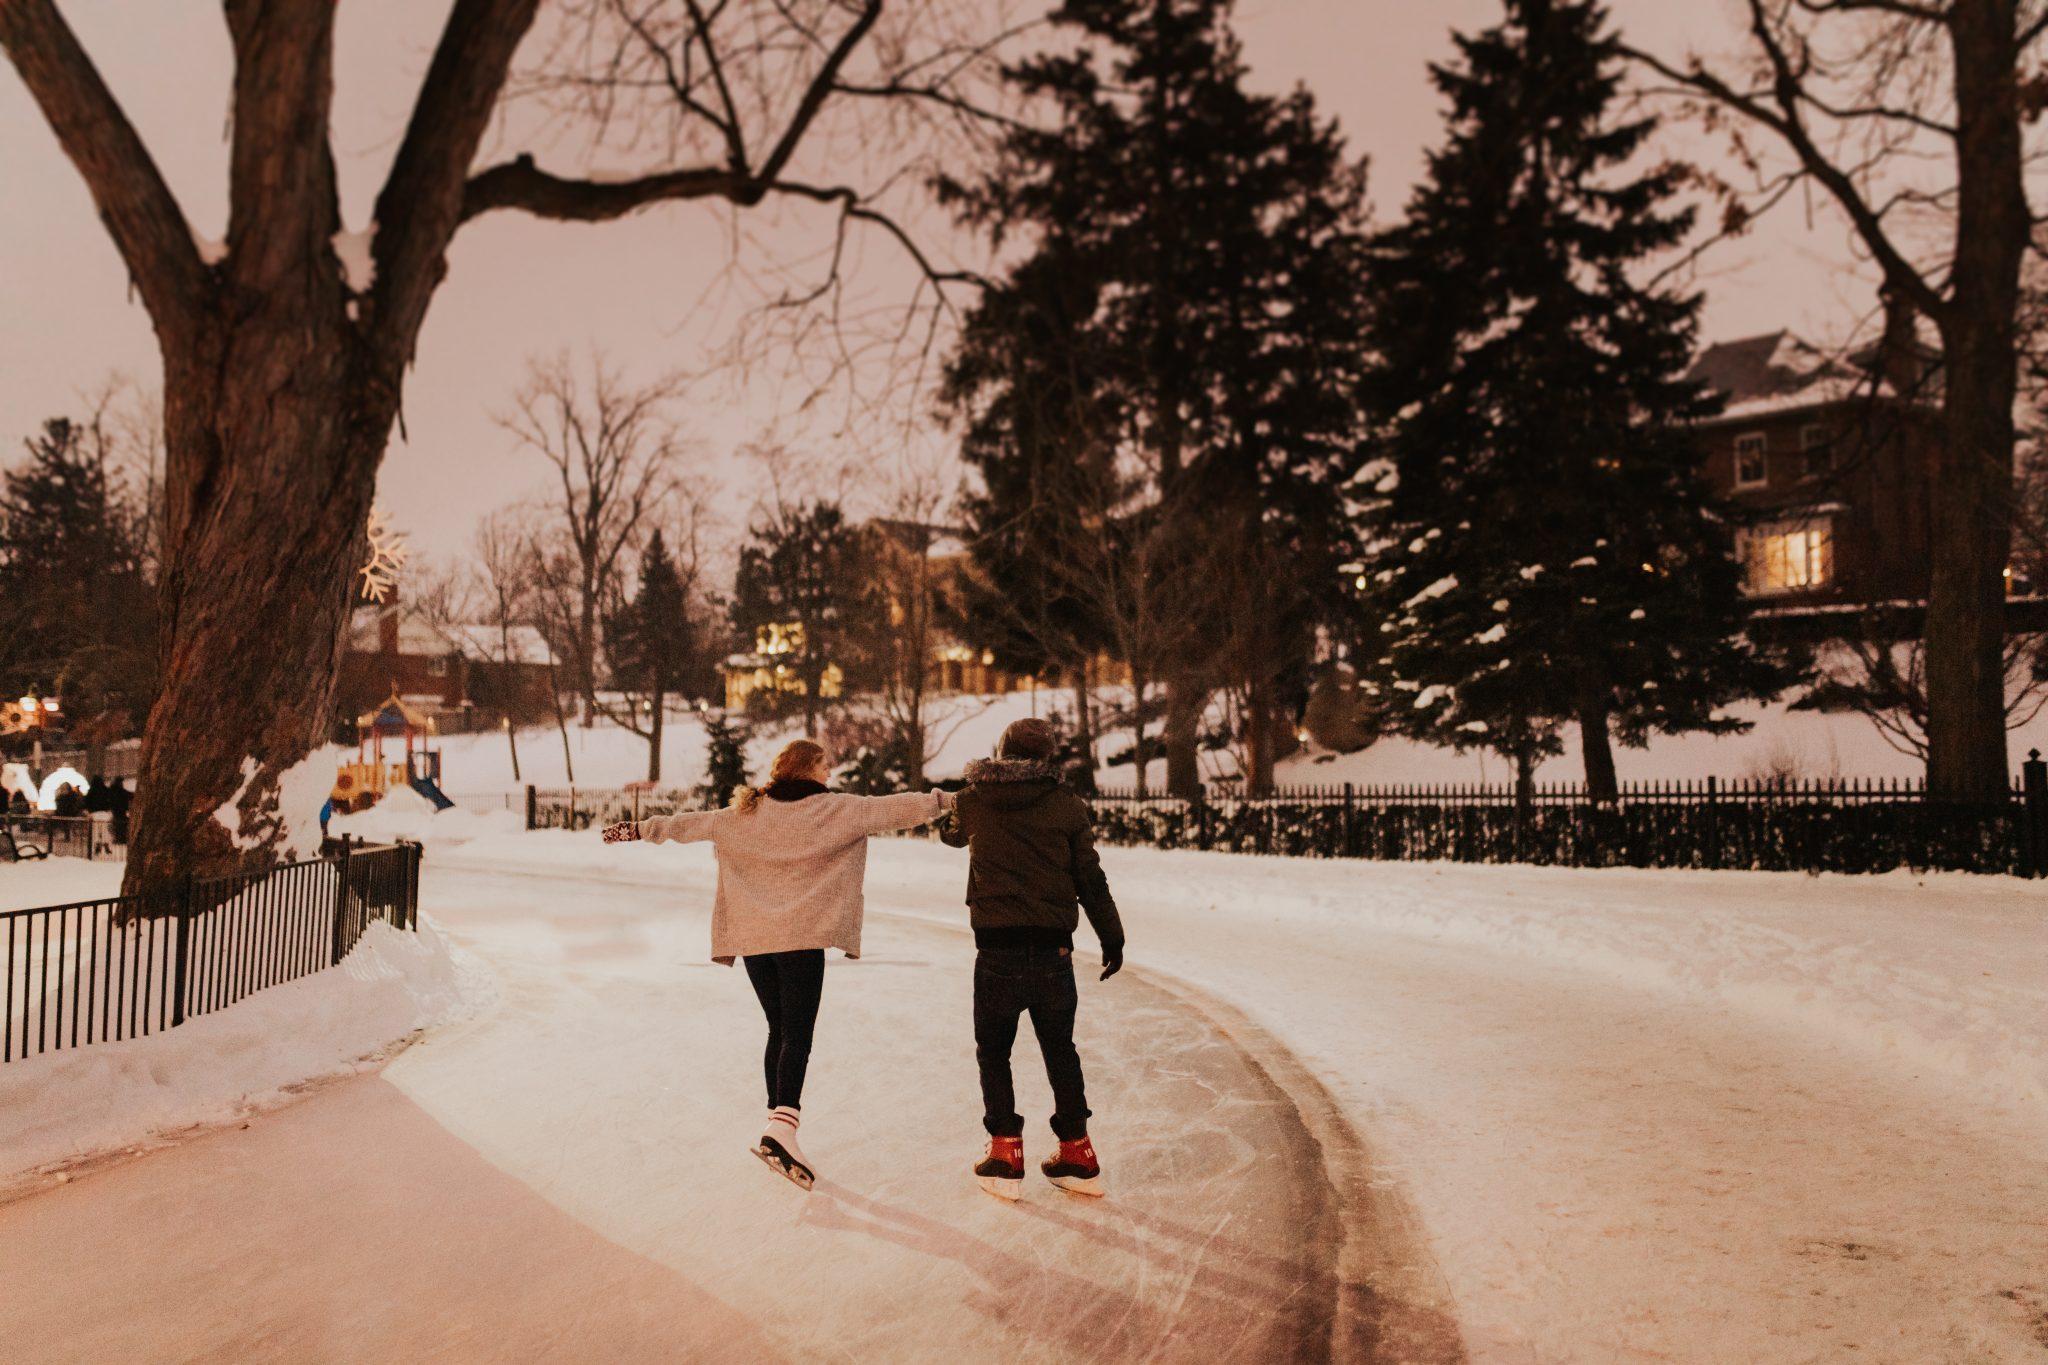 outdoor skating photos Toronto